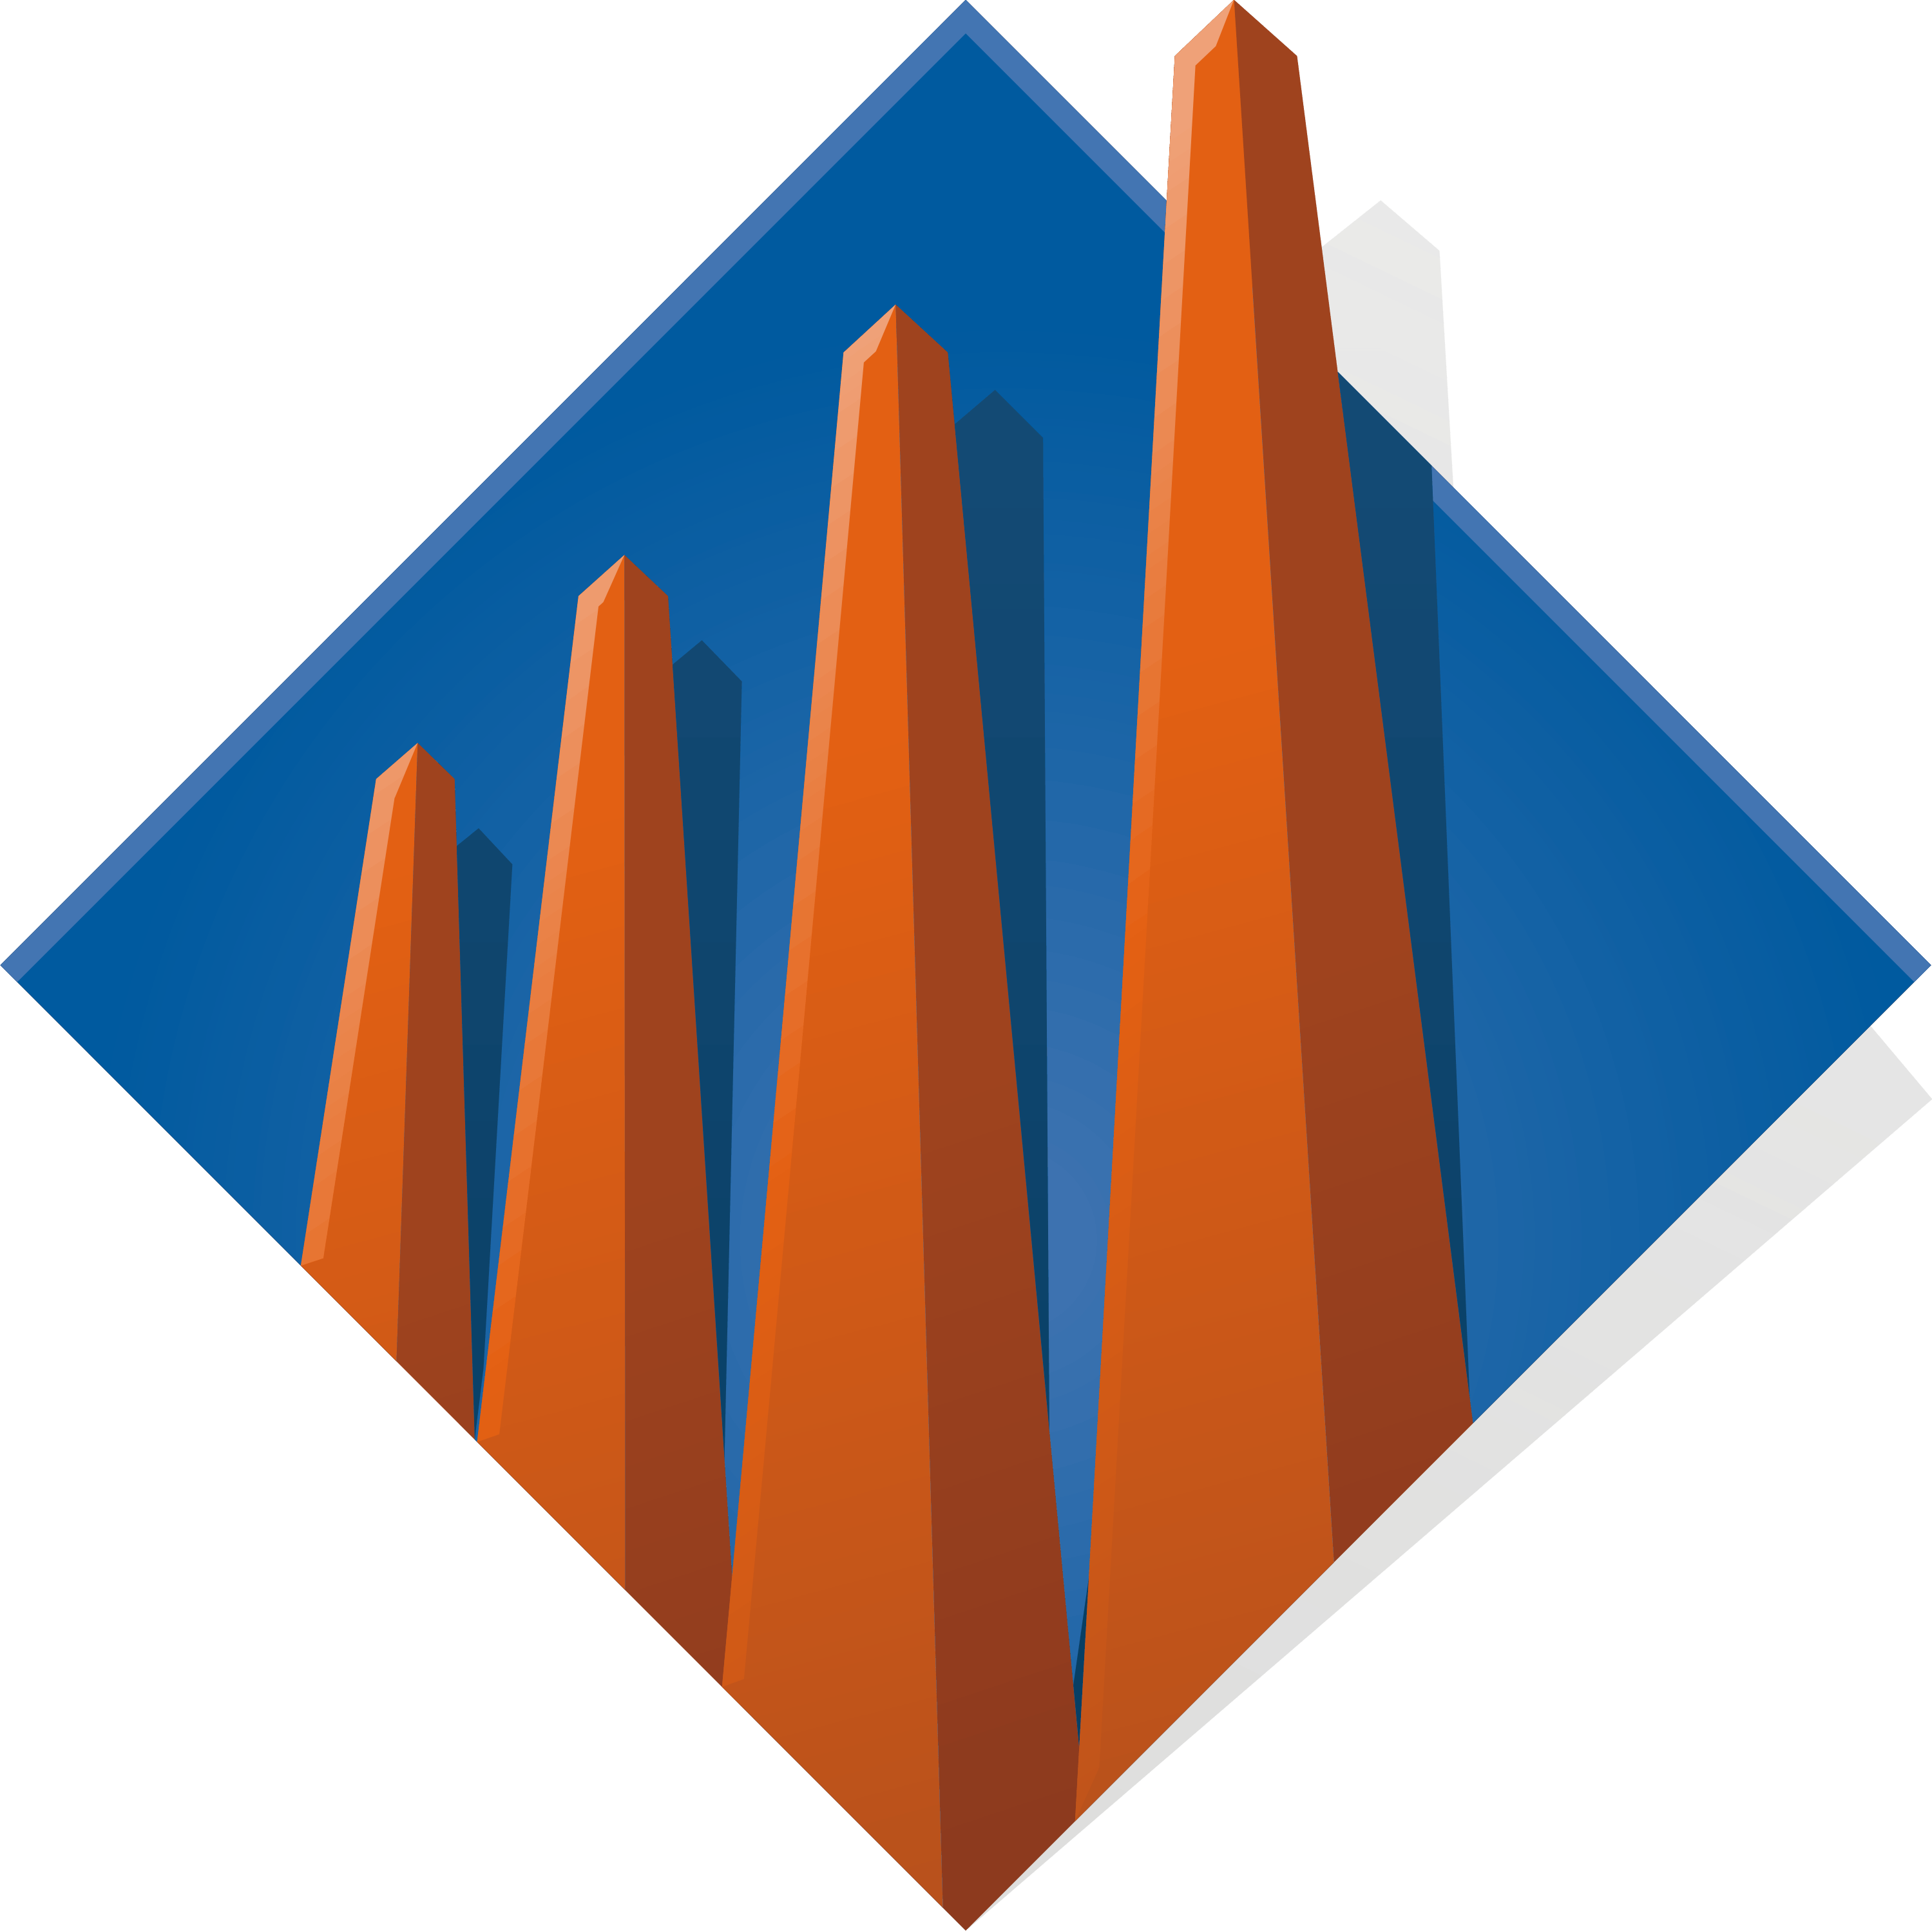 Col parent brand icon fullcolour lightbackground